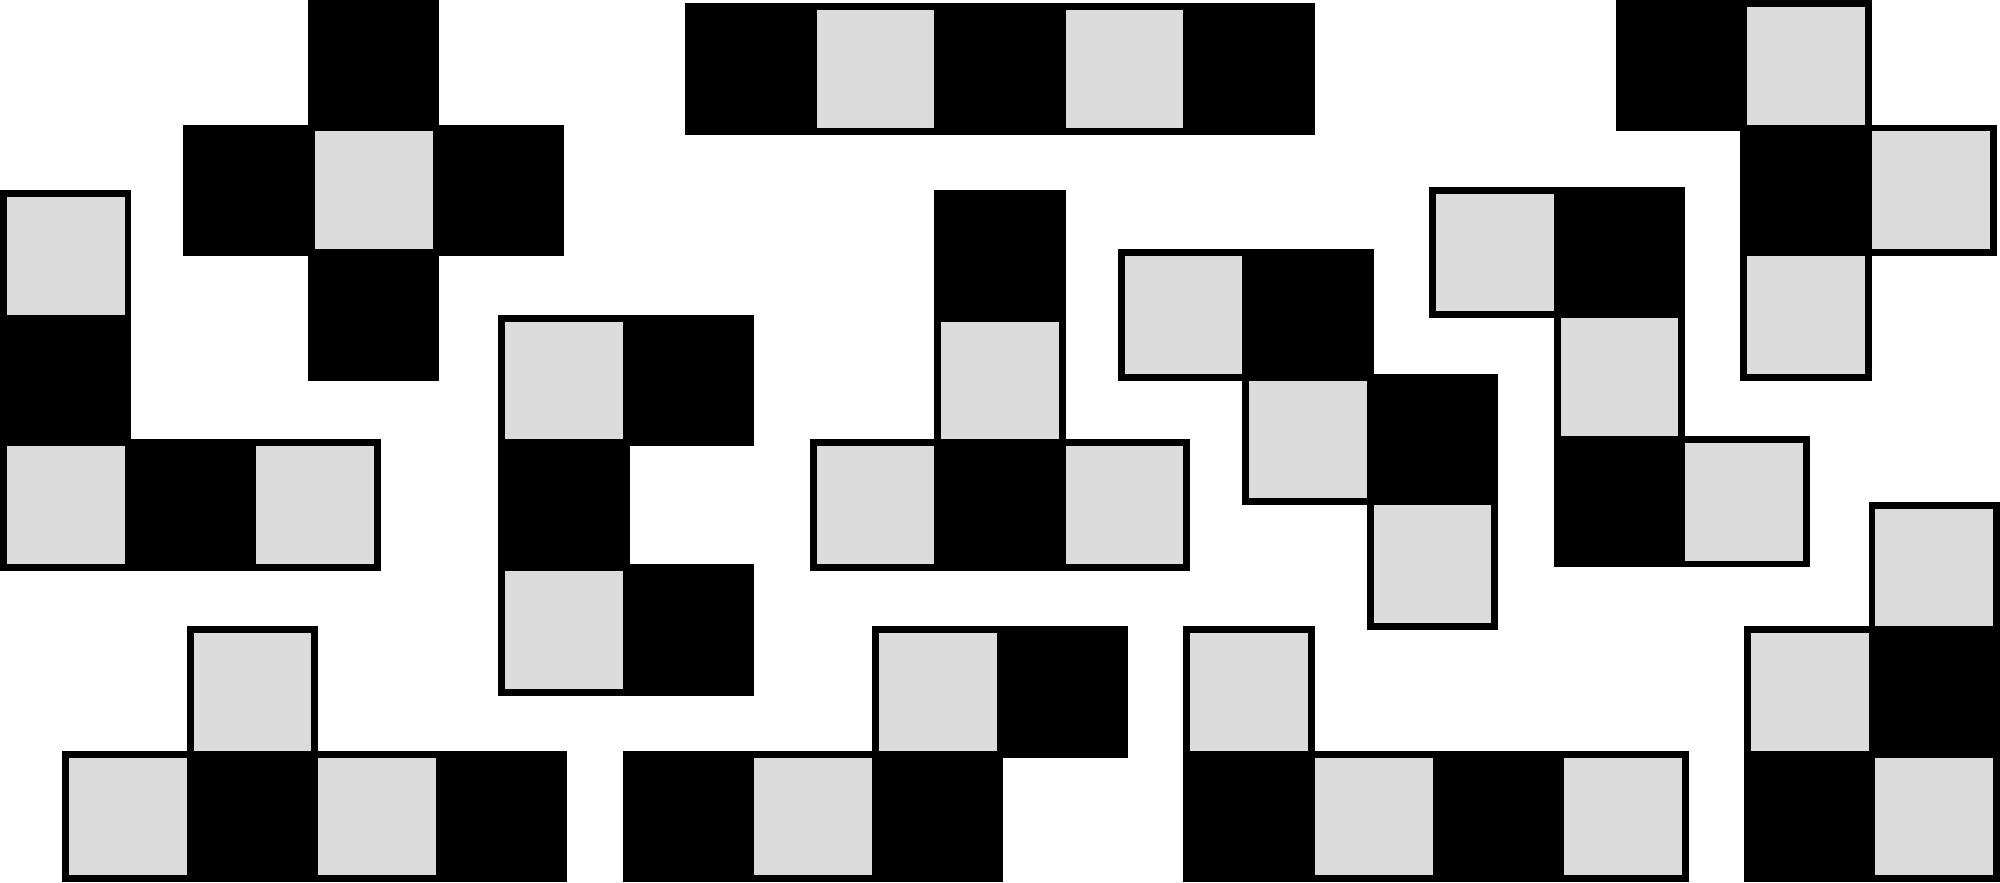 worksheet Pentominoes Worksheet pentominoes a k polyominoes copyright j storer storer